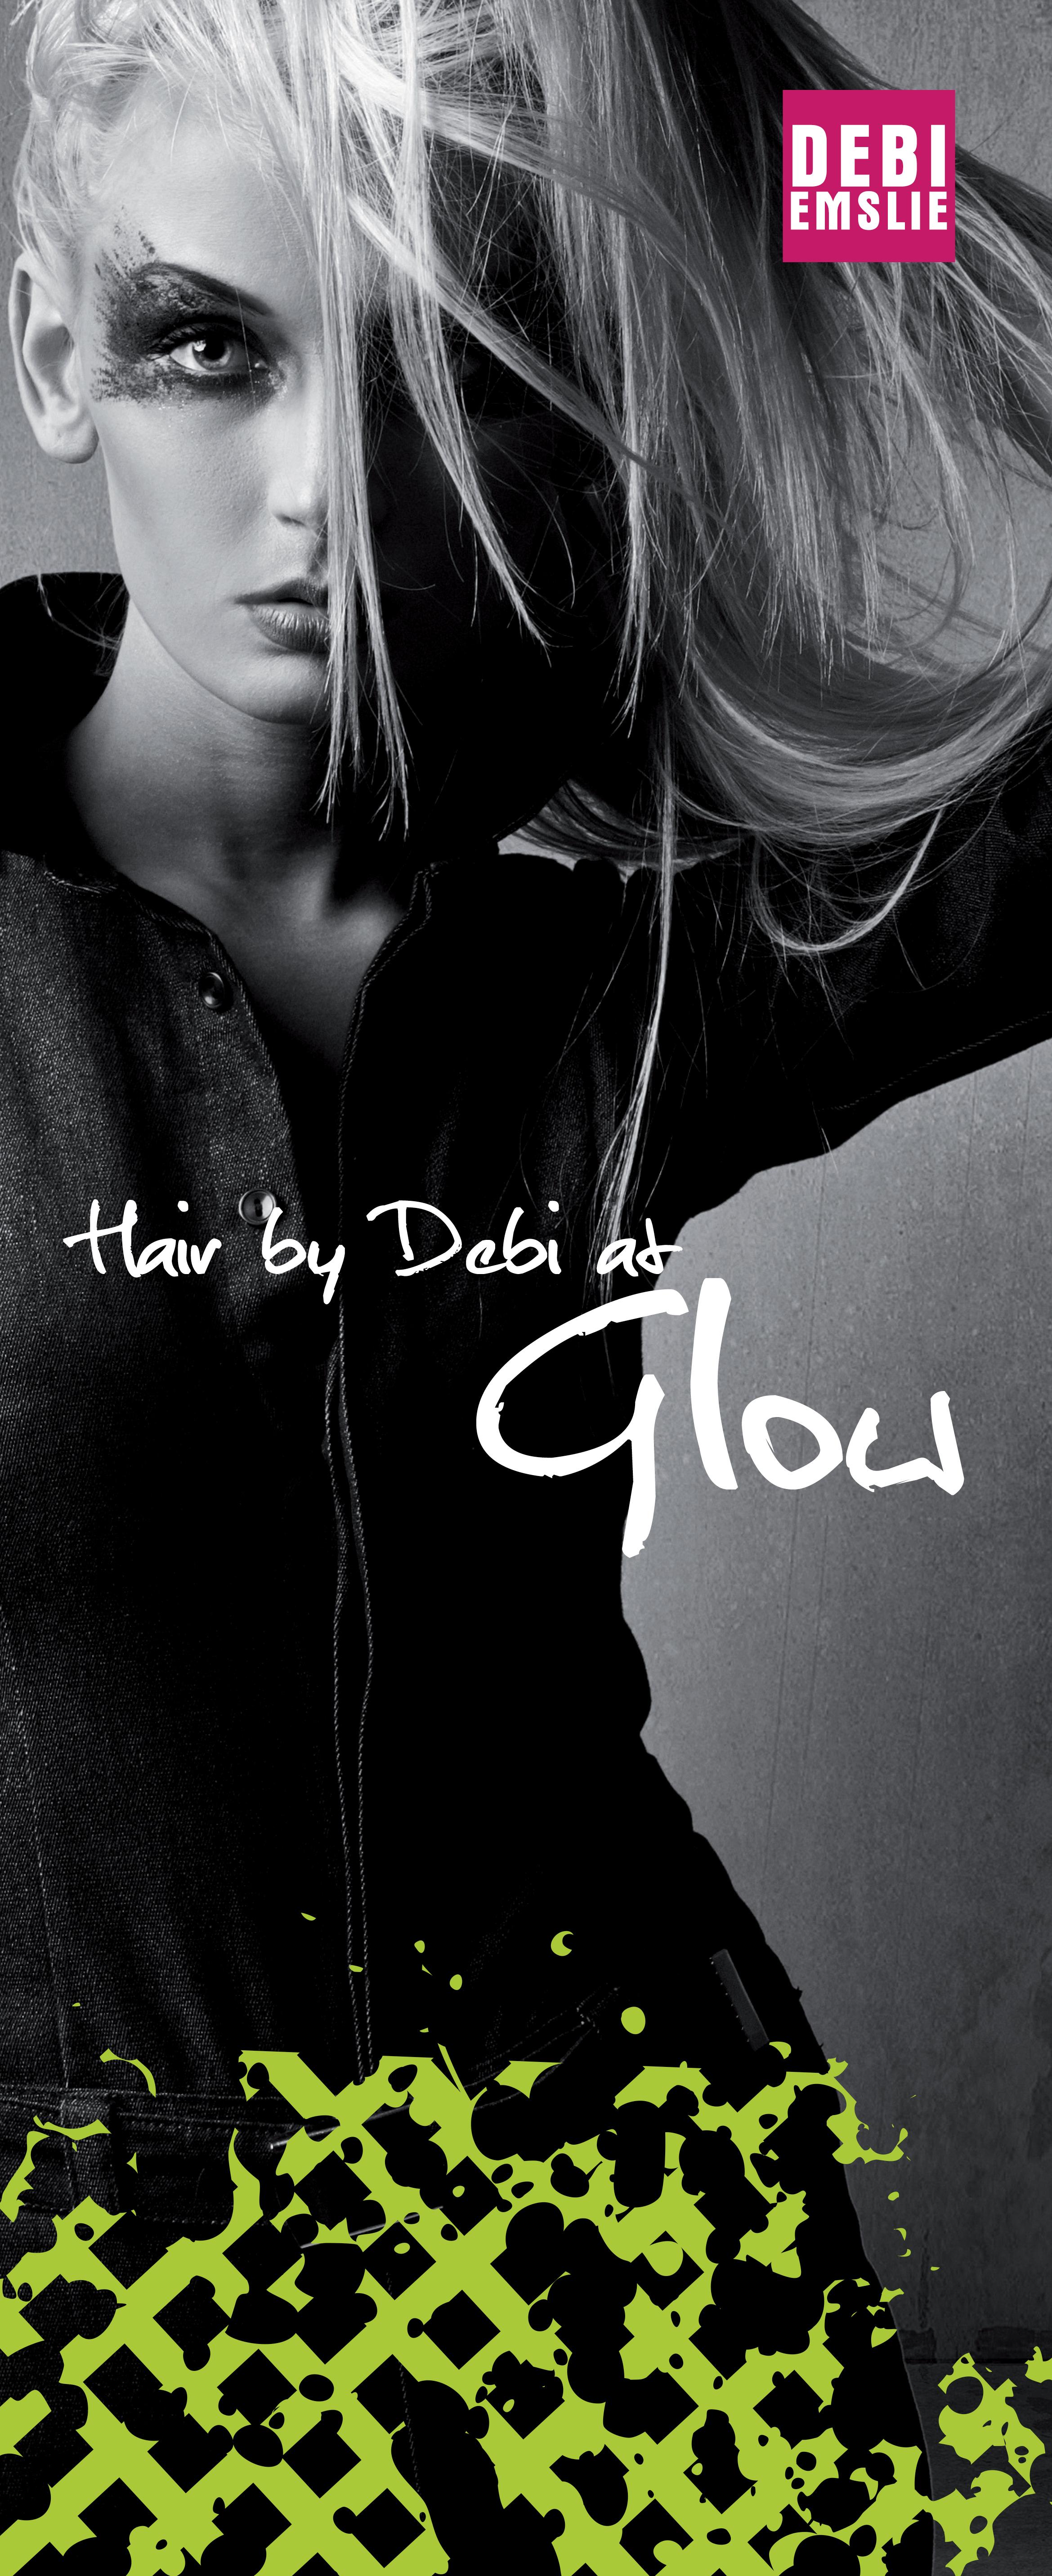 Glow - Hair By Debi, Glasgow - Health & Beauty - 5pm.co.uk